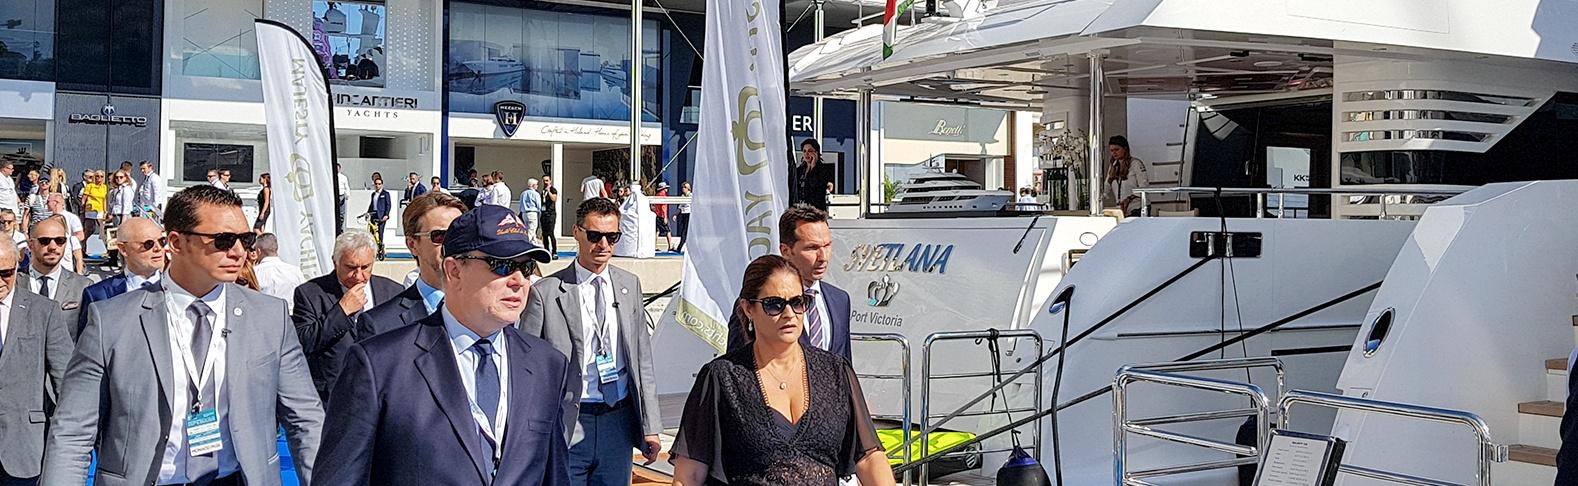 Gulf-Craft,-Prince-Albert-II,-Monaco-Yacht-Show-2018